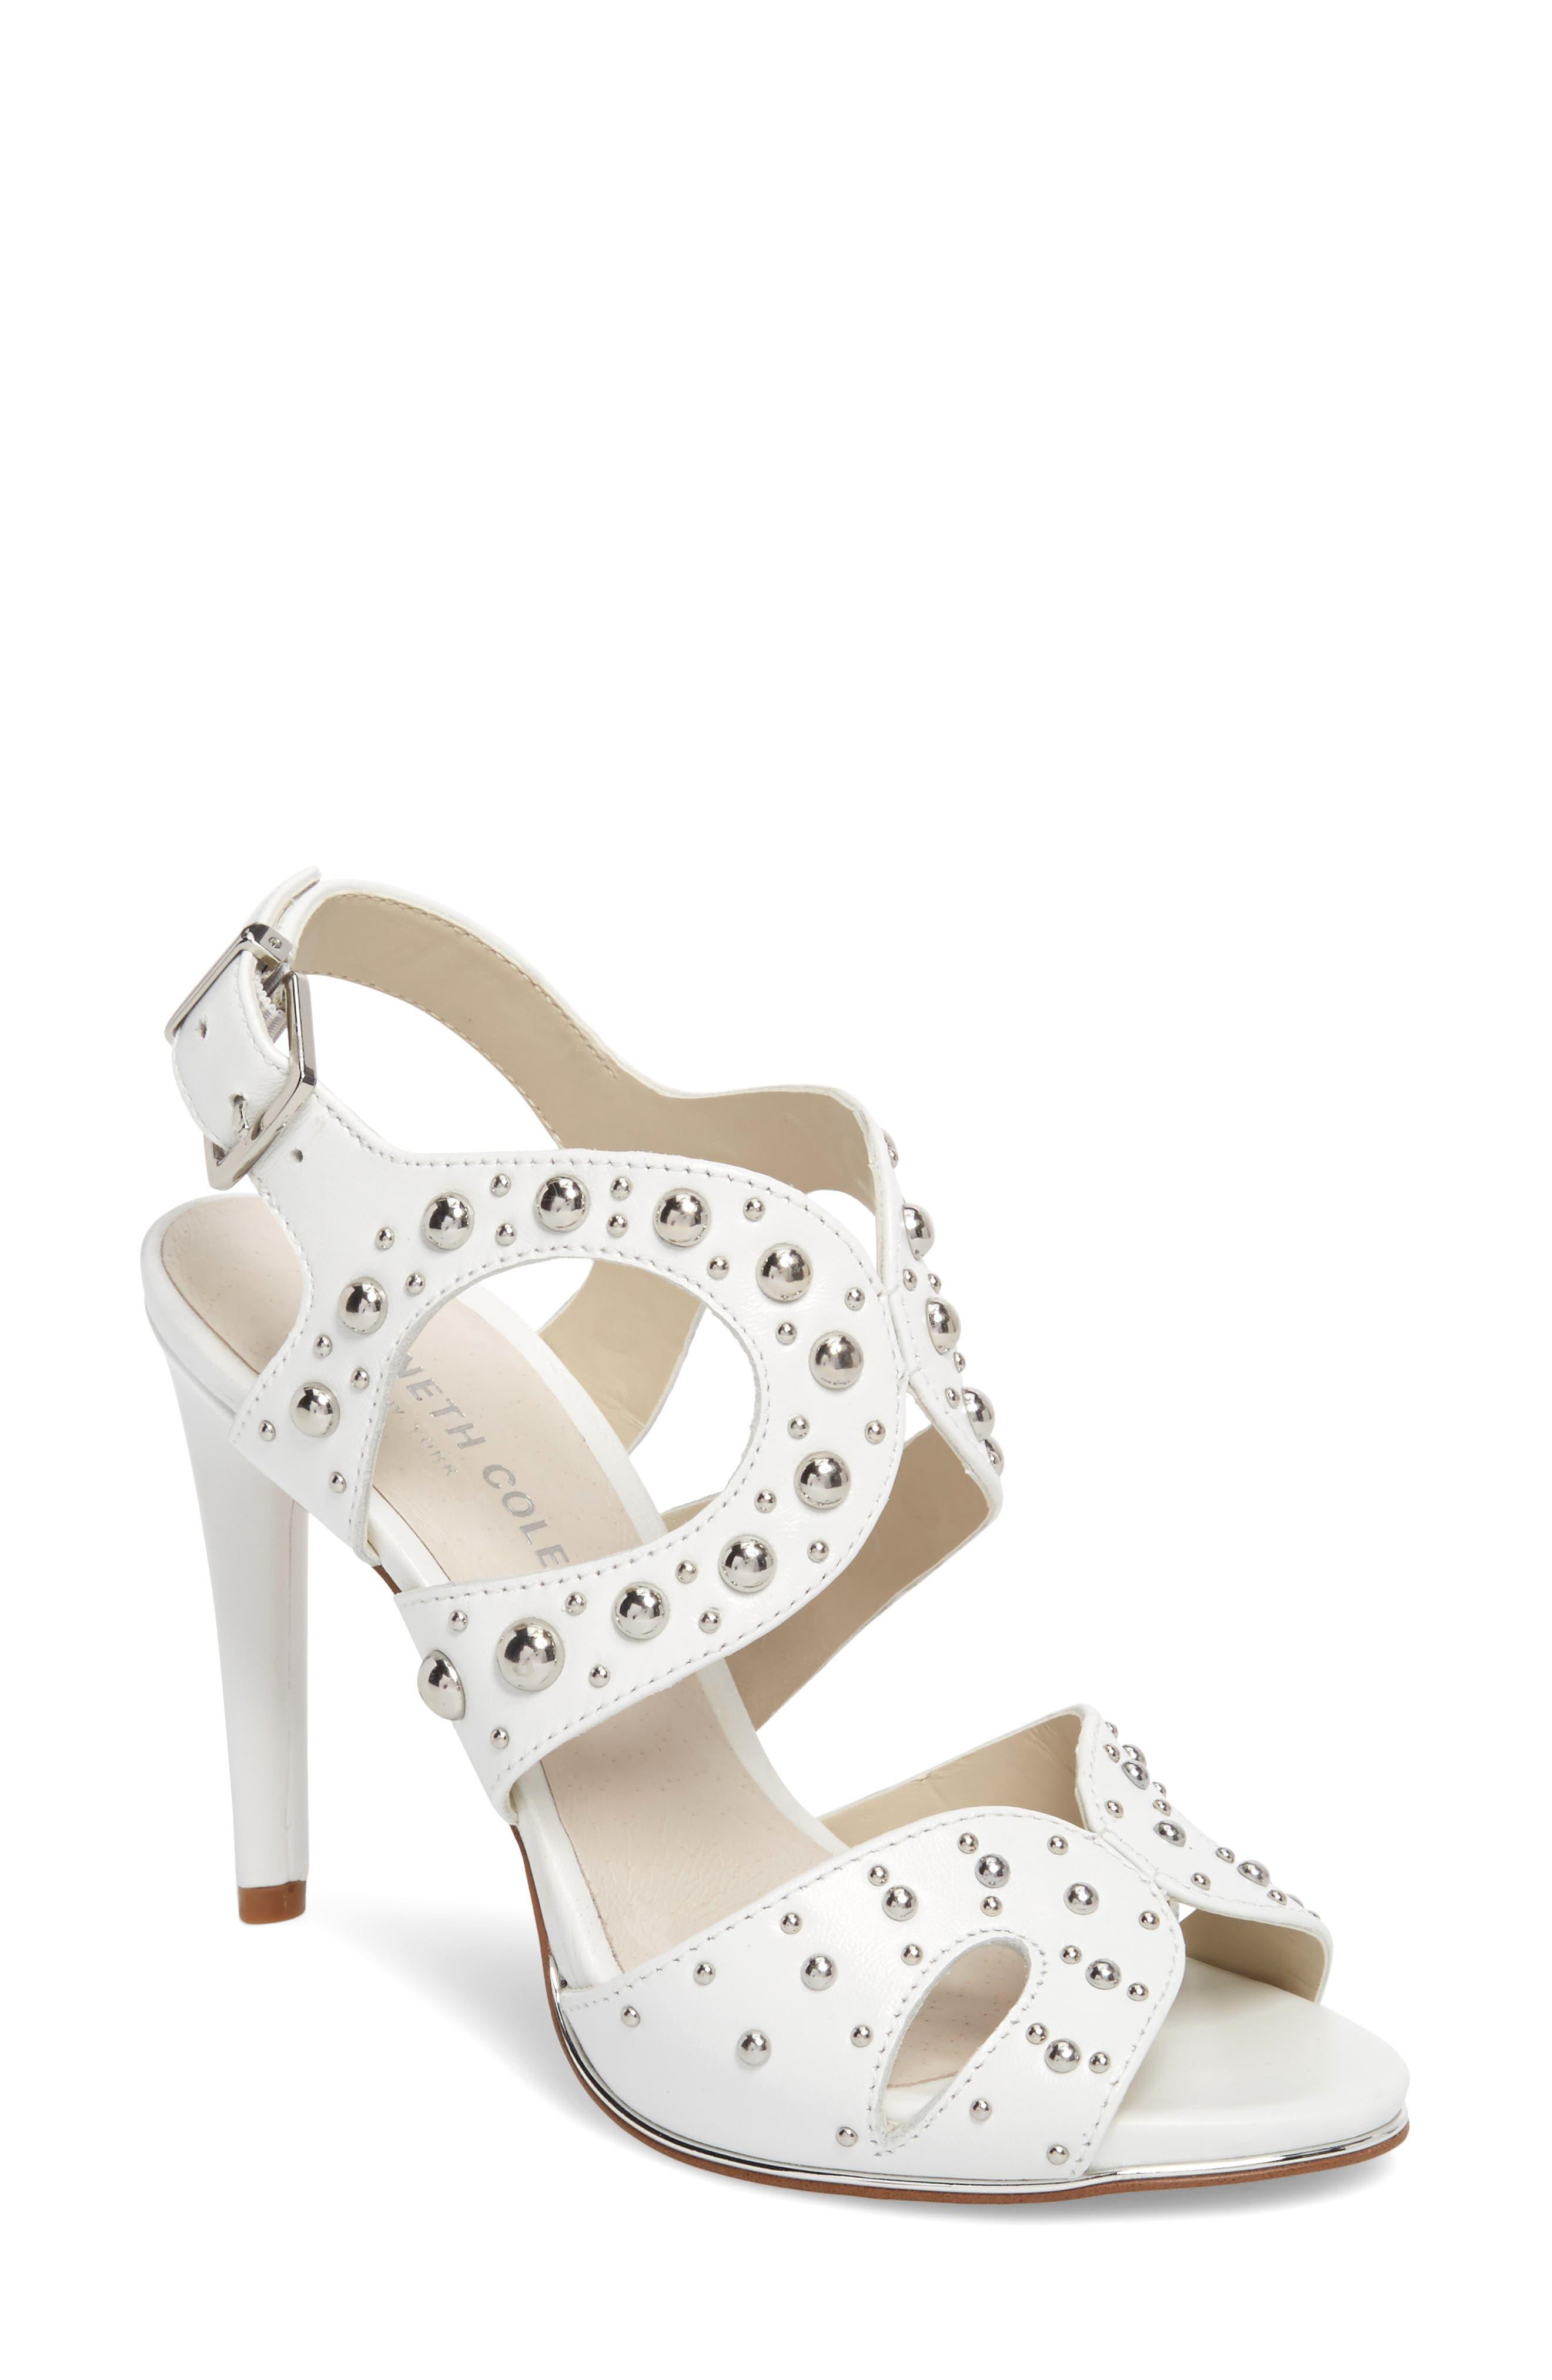 Baldwin Stud Sandal,                         Main,                         color, White Leather